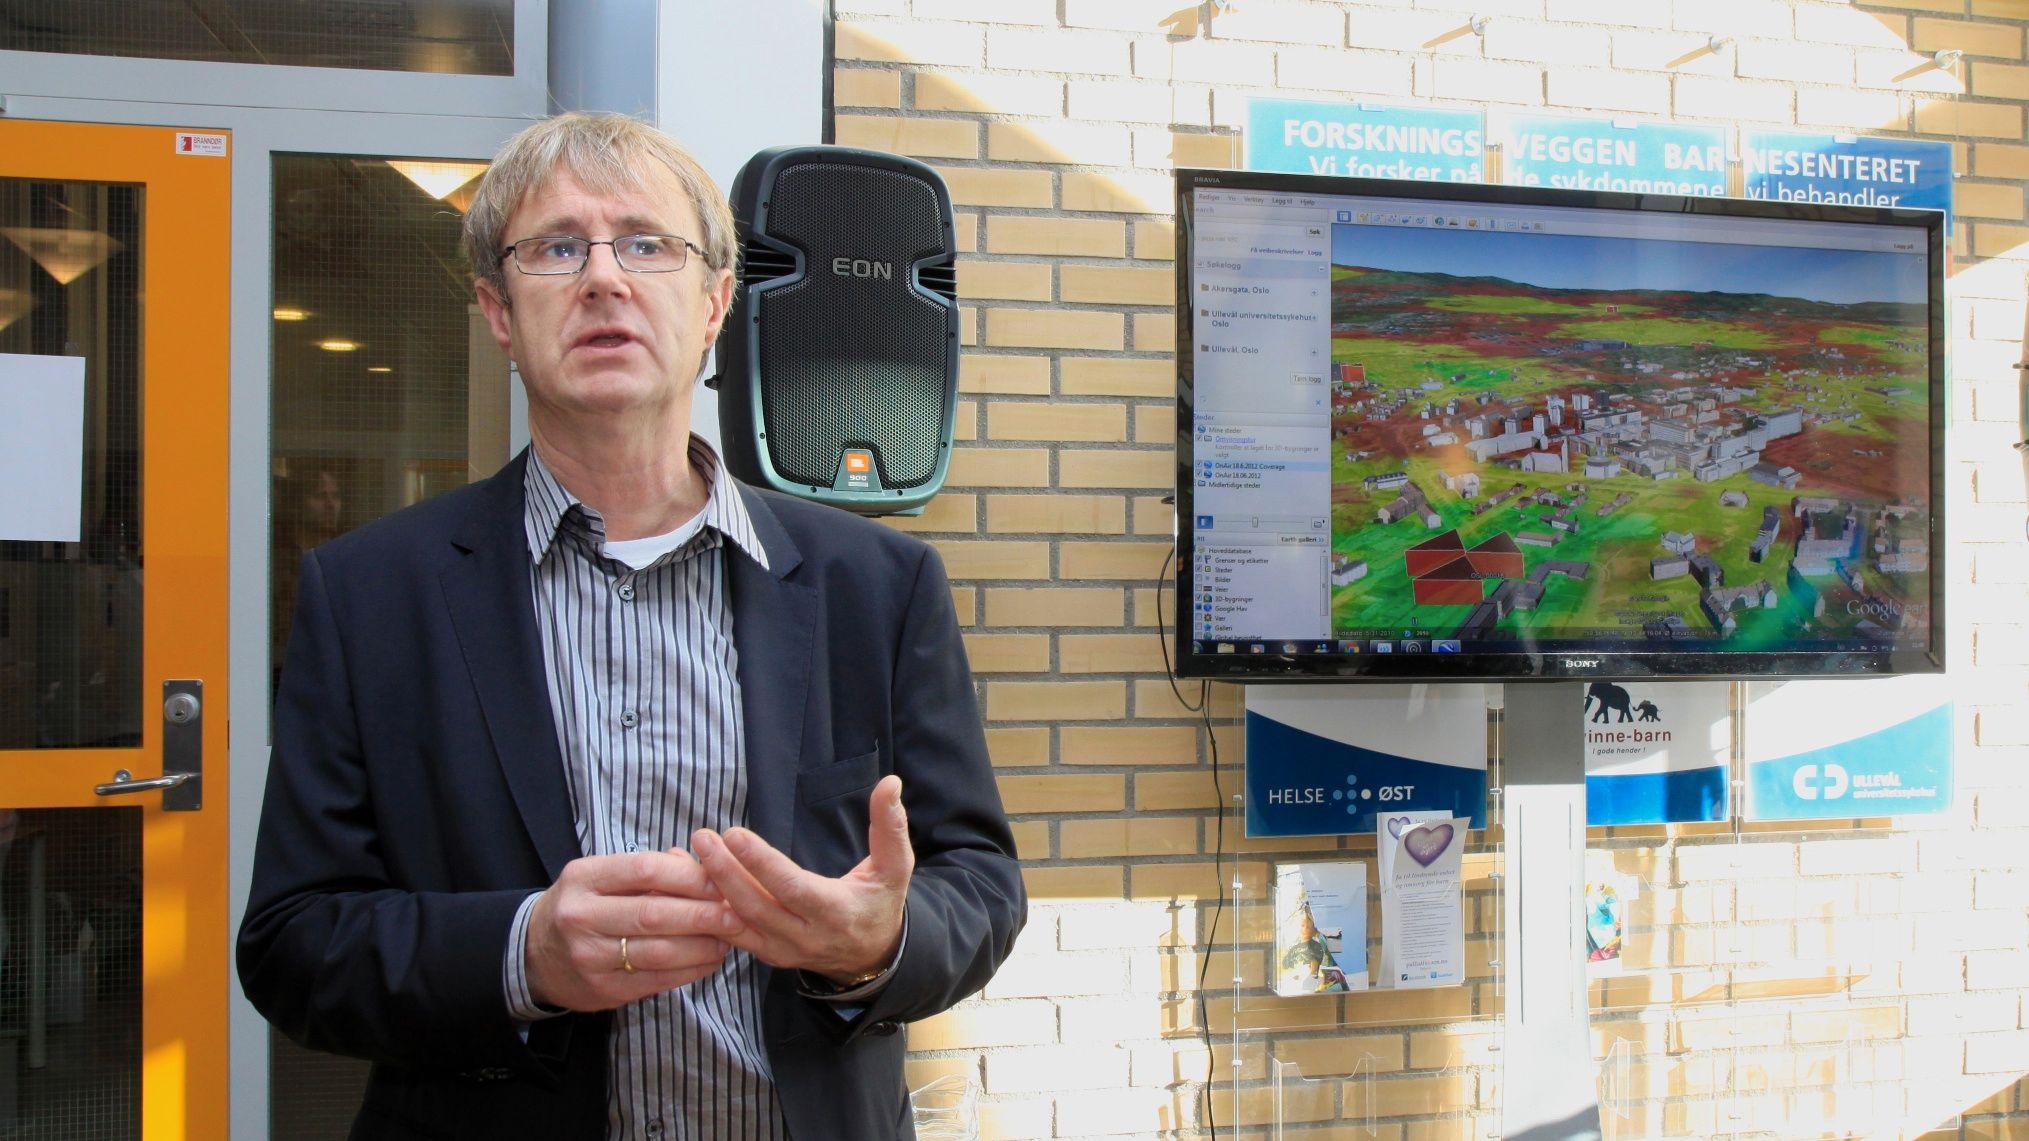 Telenors dekningsdirektør Bjørn Amundsen fortalte om 4G-dekningen under Telenors pressekonferanse på .Foto: Kurt Lekanger, Amobil.no